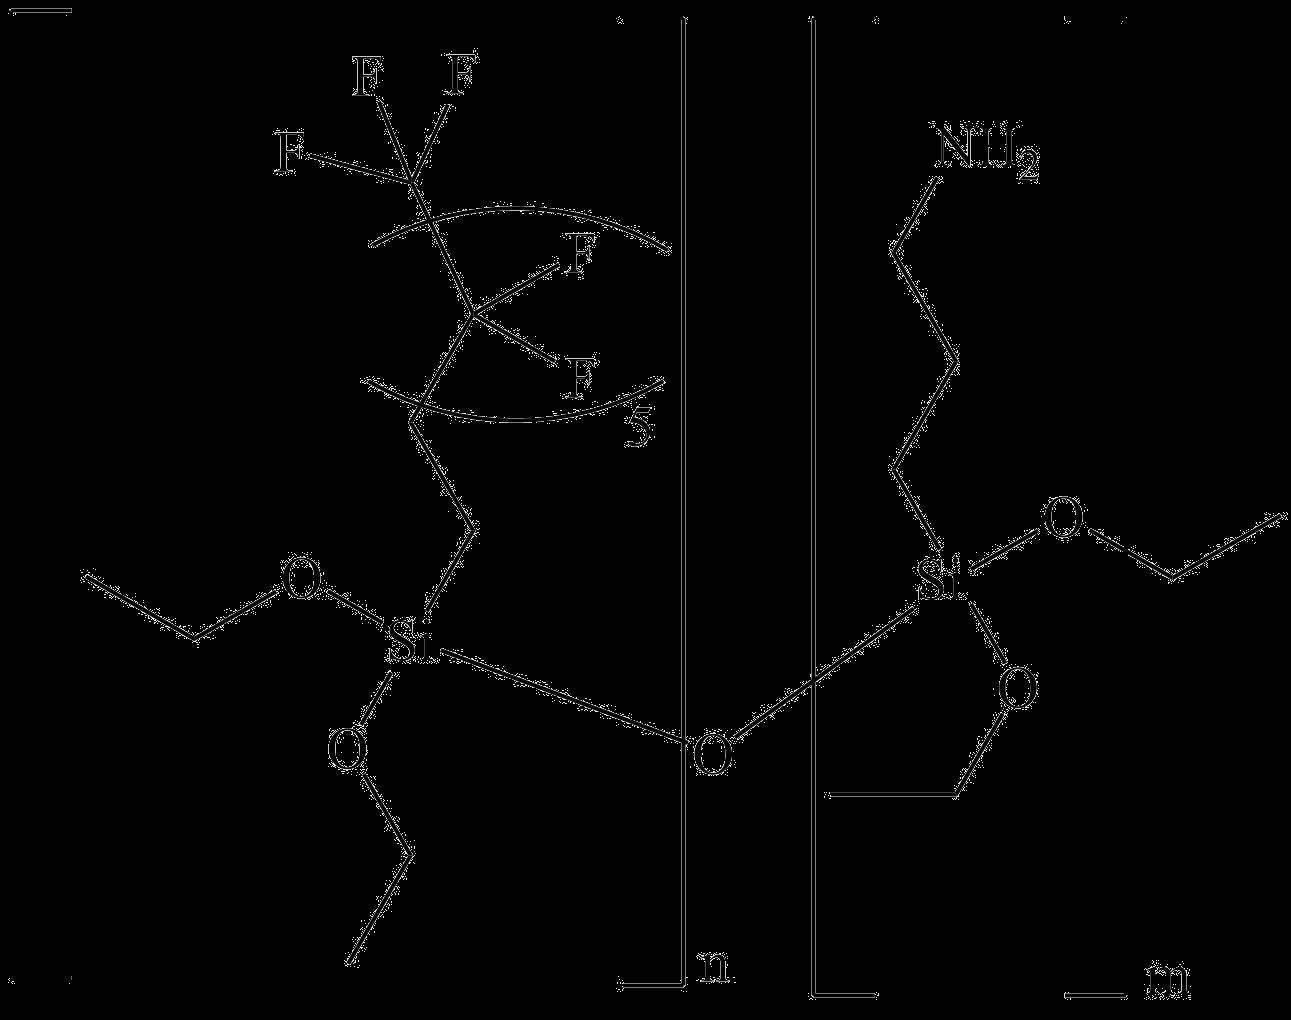 185911-29-9/58160-99-9